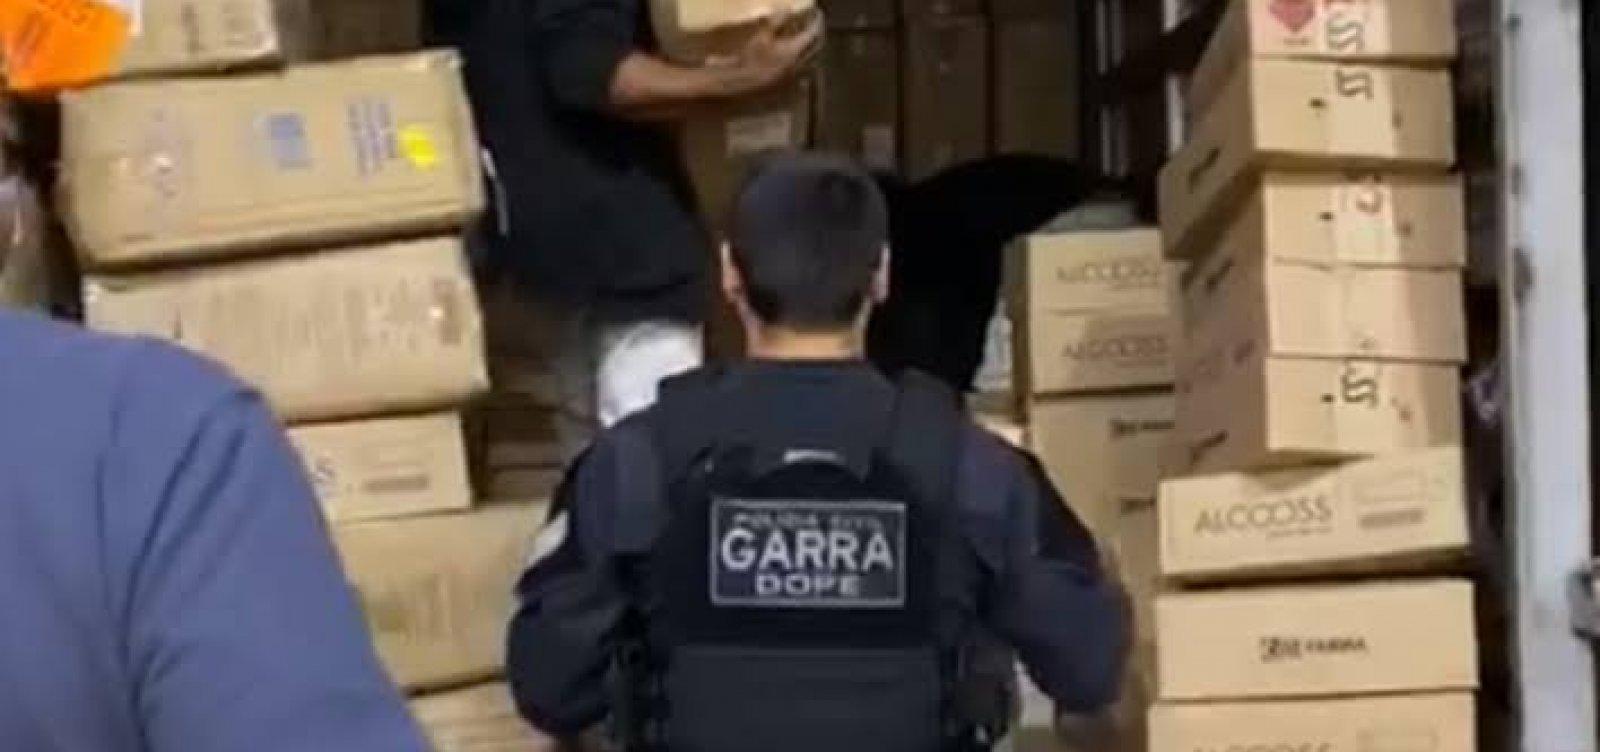 [Polícia prende quadrilha por furto de 2 milhões de máscaras e 15 mil testes de coronavírus]